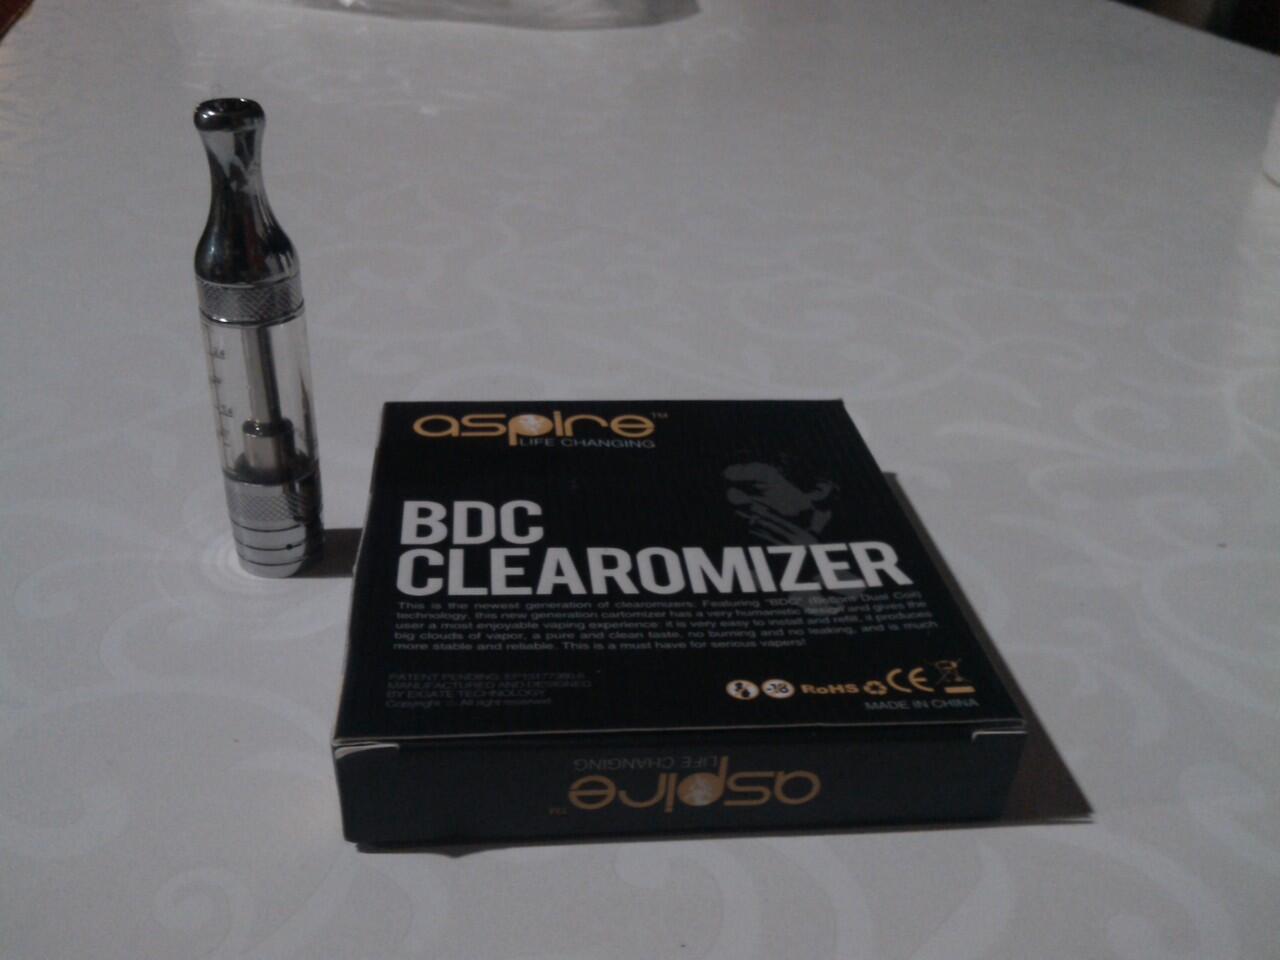 Clearomizer Tank ASPIRE BDC DUAL COIL / VAPORIZER / VAPING / VAPO / PV /